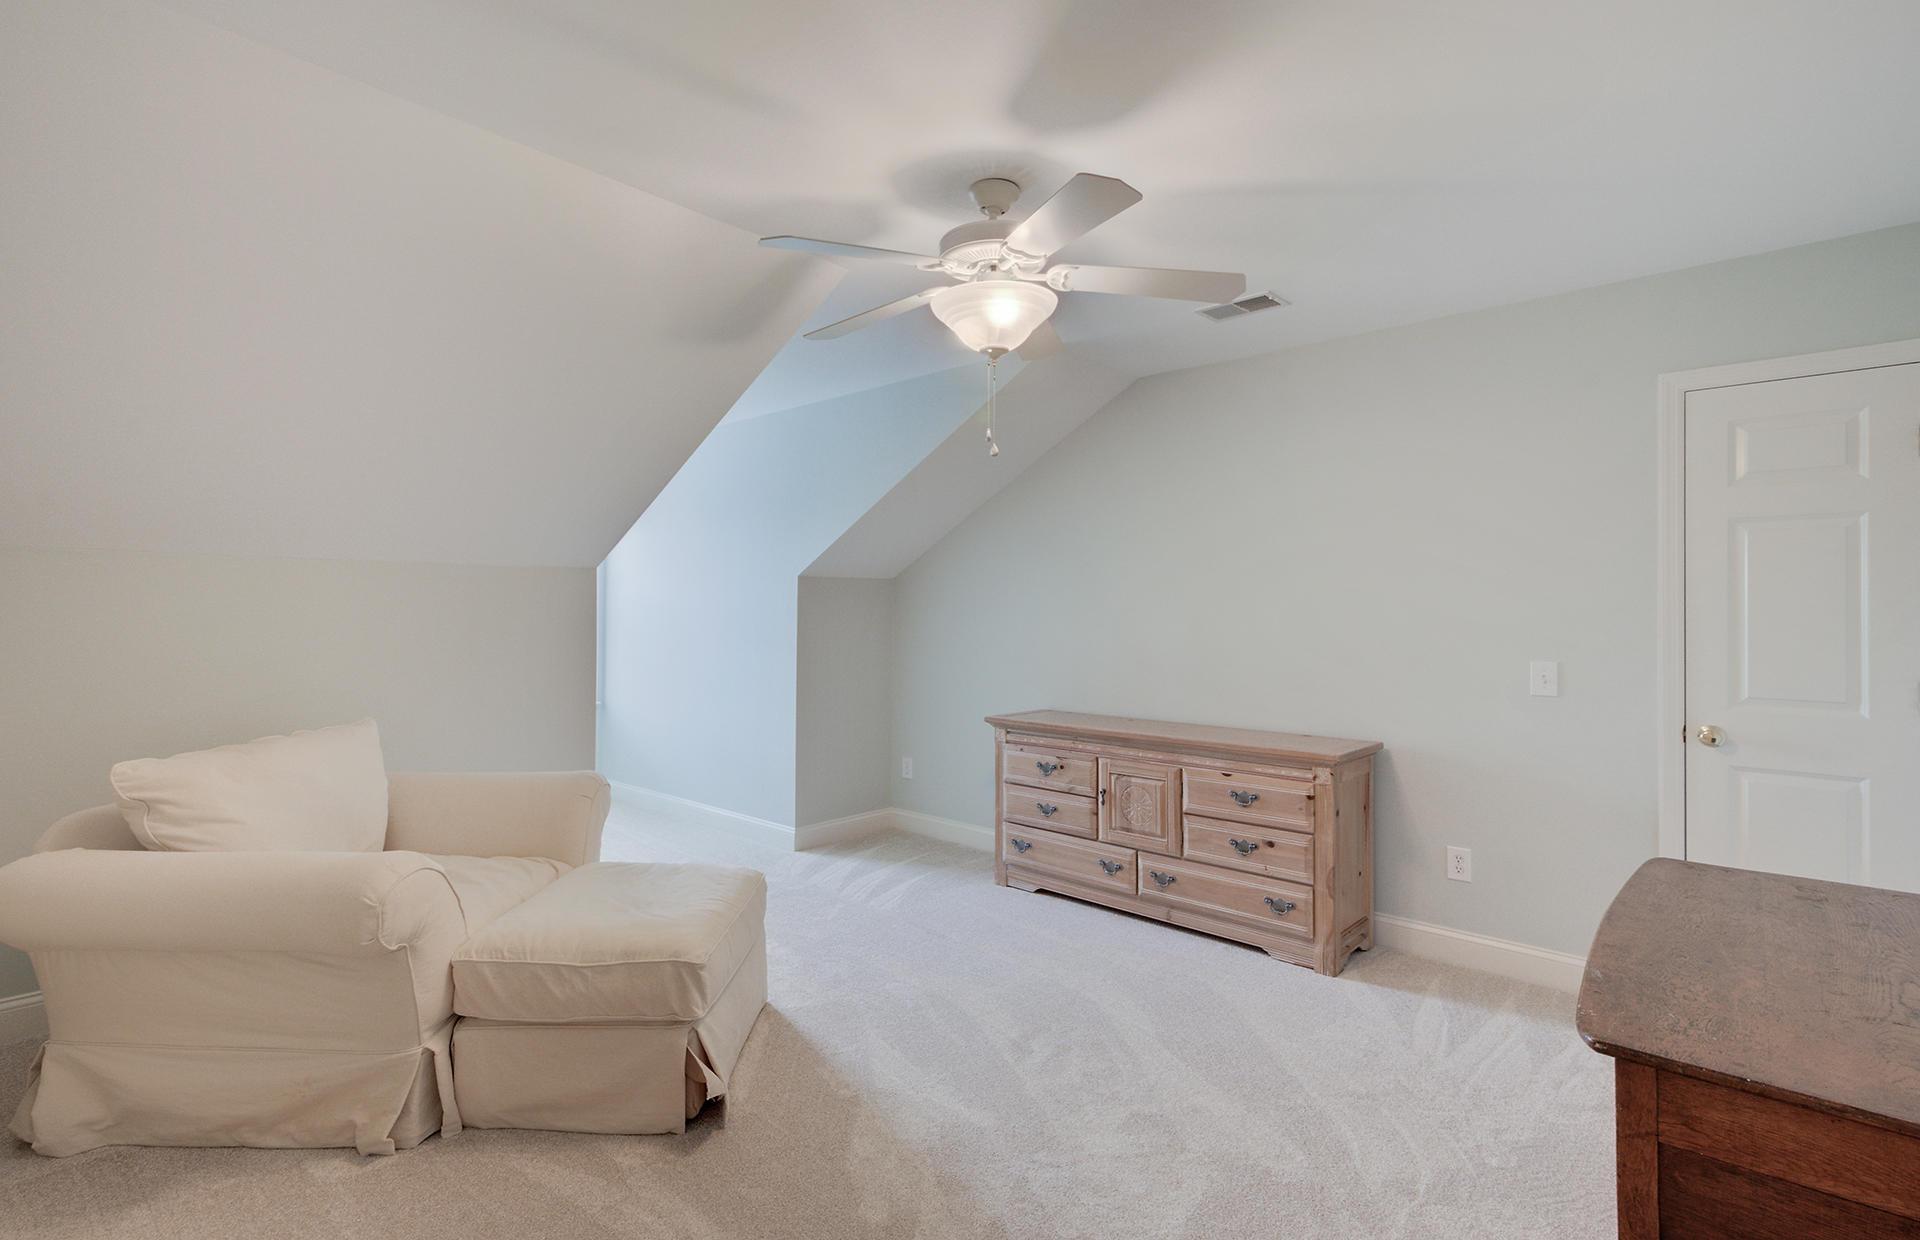 Dunes West Homes For Sale - 2453 Darts Cove, Mount Pleasant, SC - 26